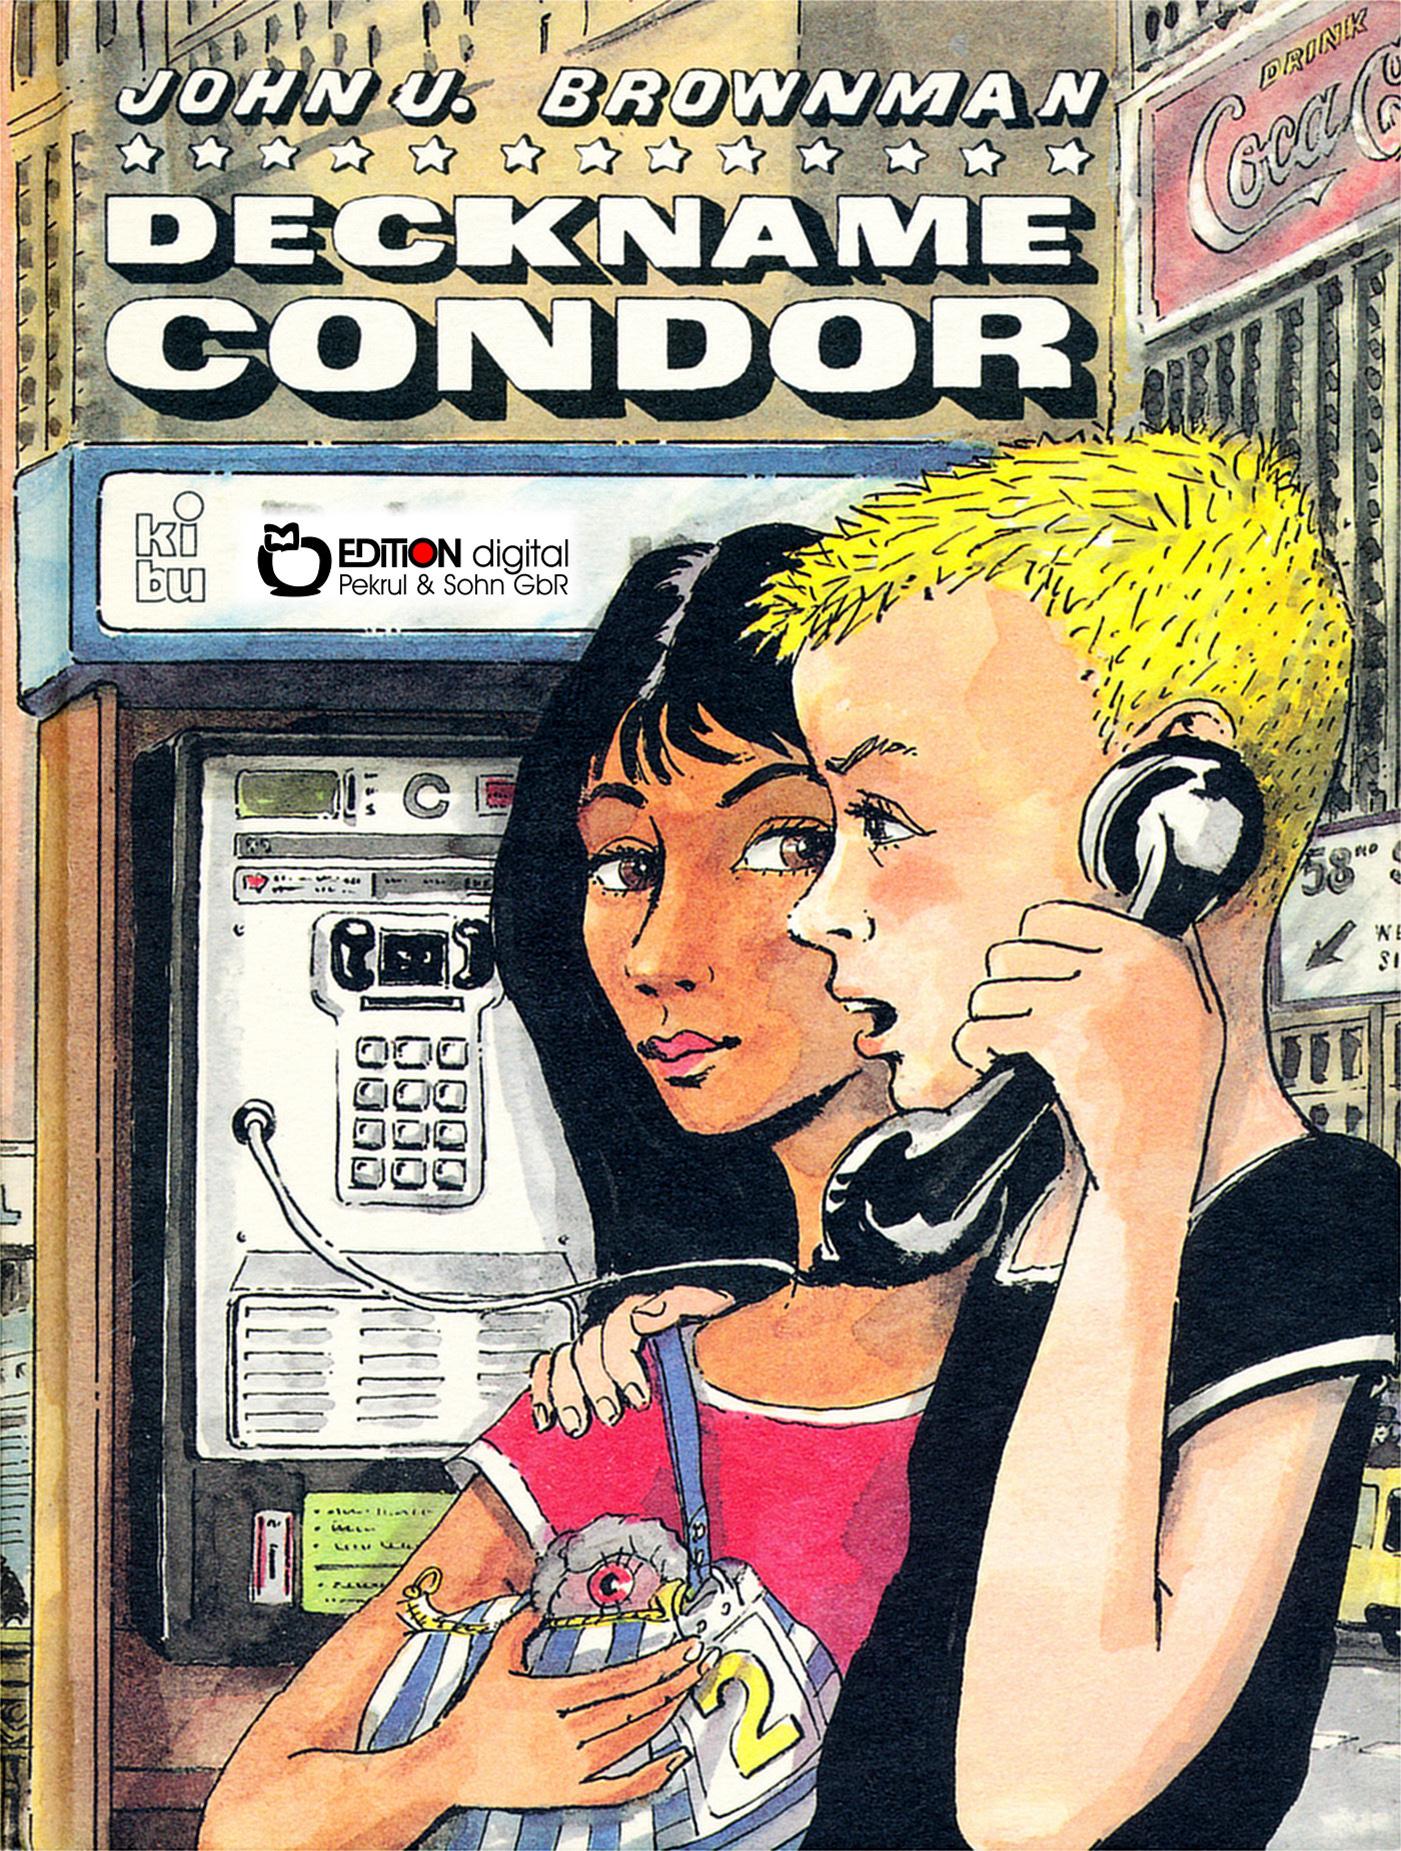 Deckname Condor. von John U. Brownman